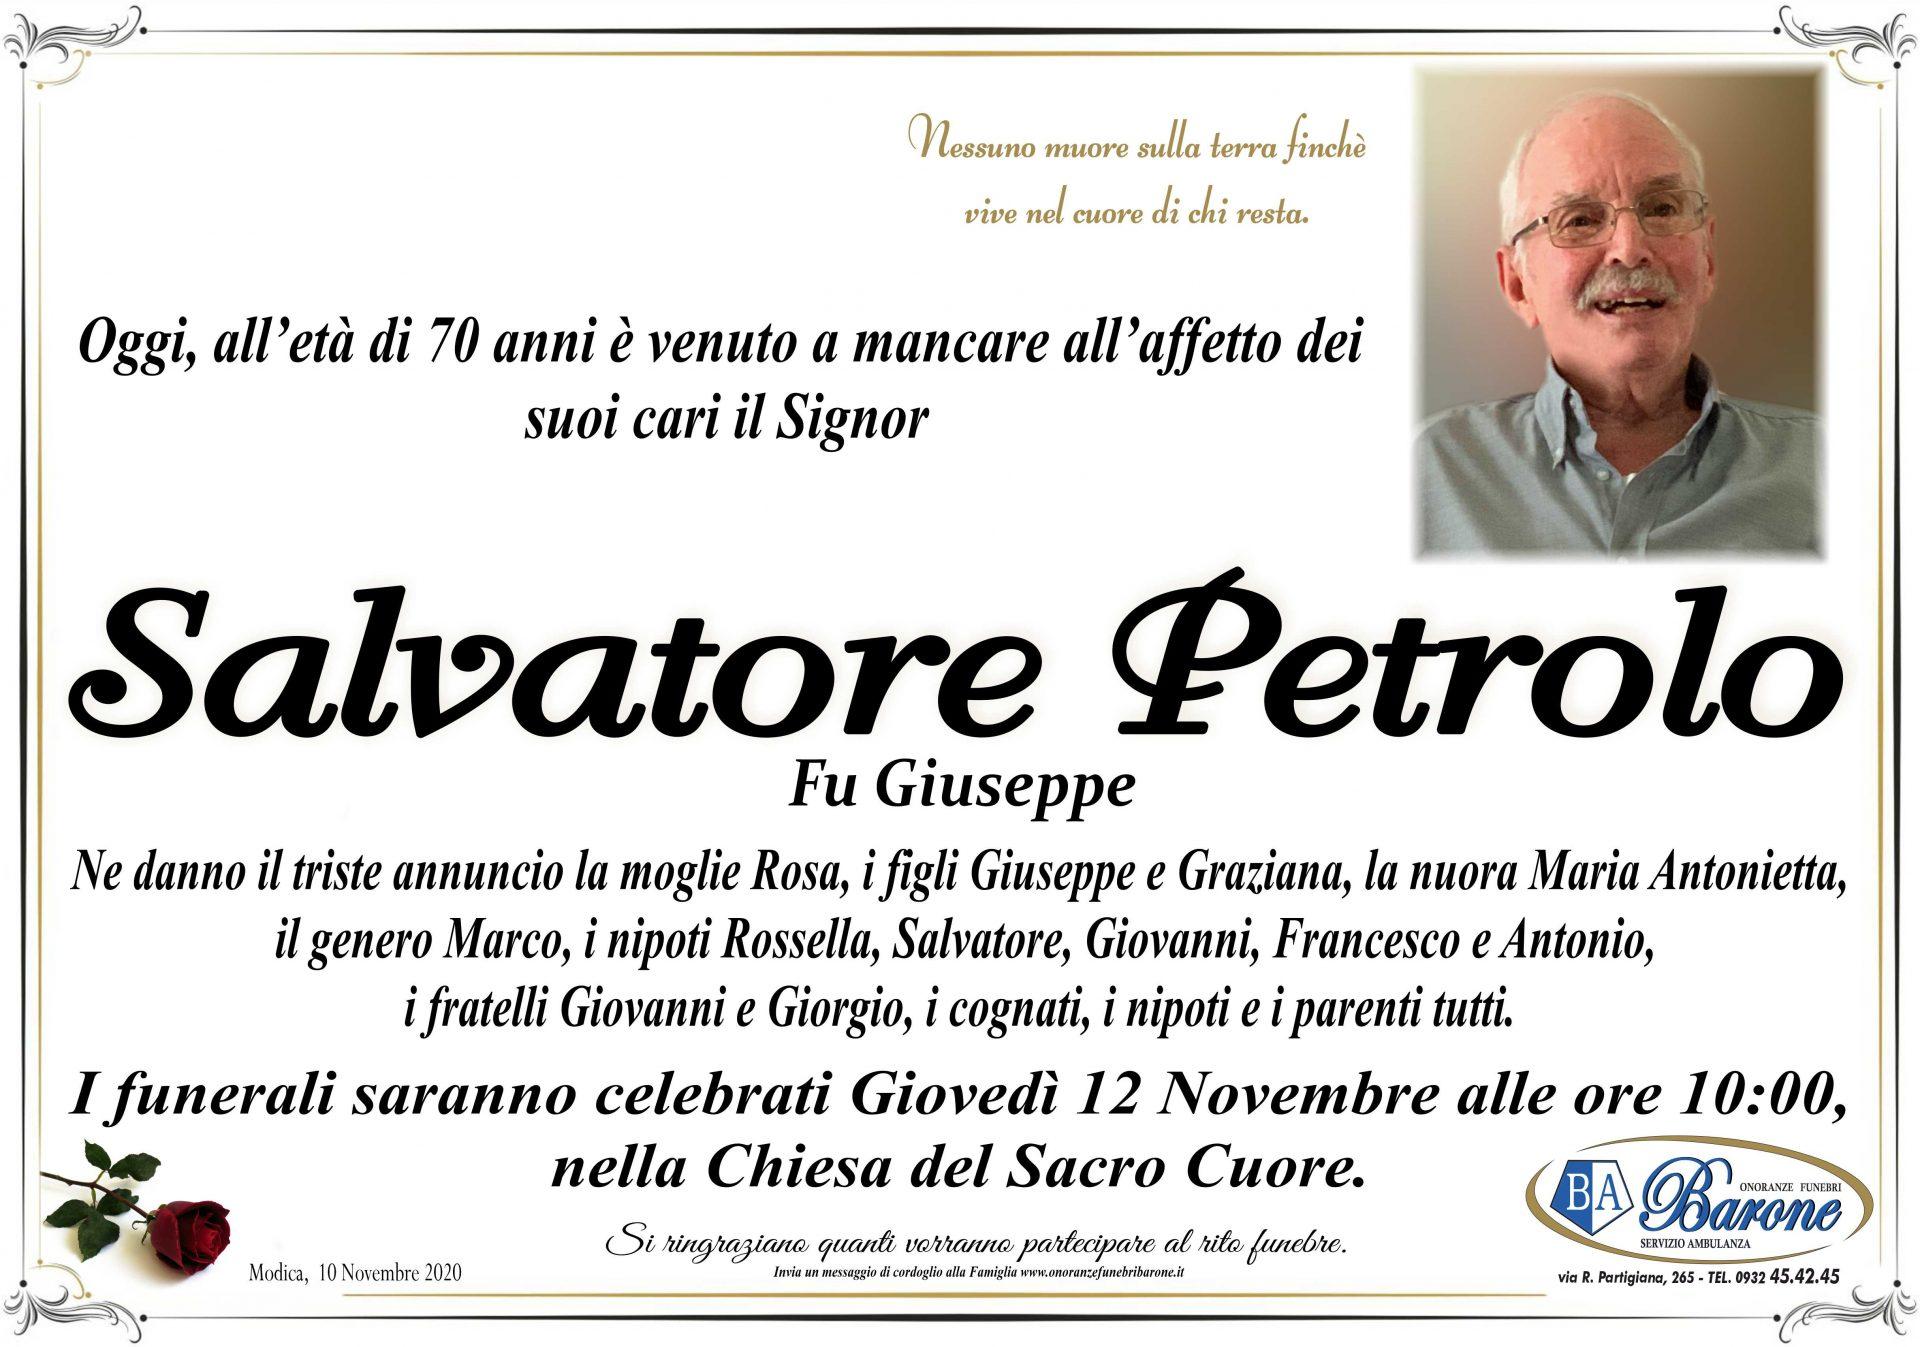 Salvatore Petrolo